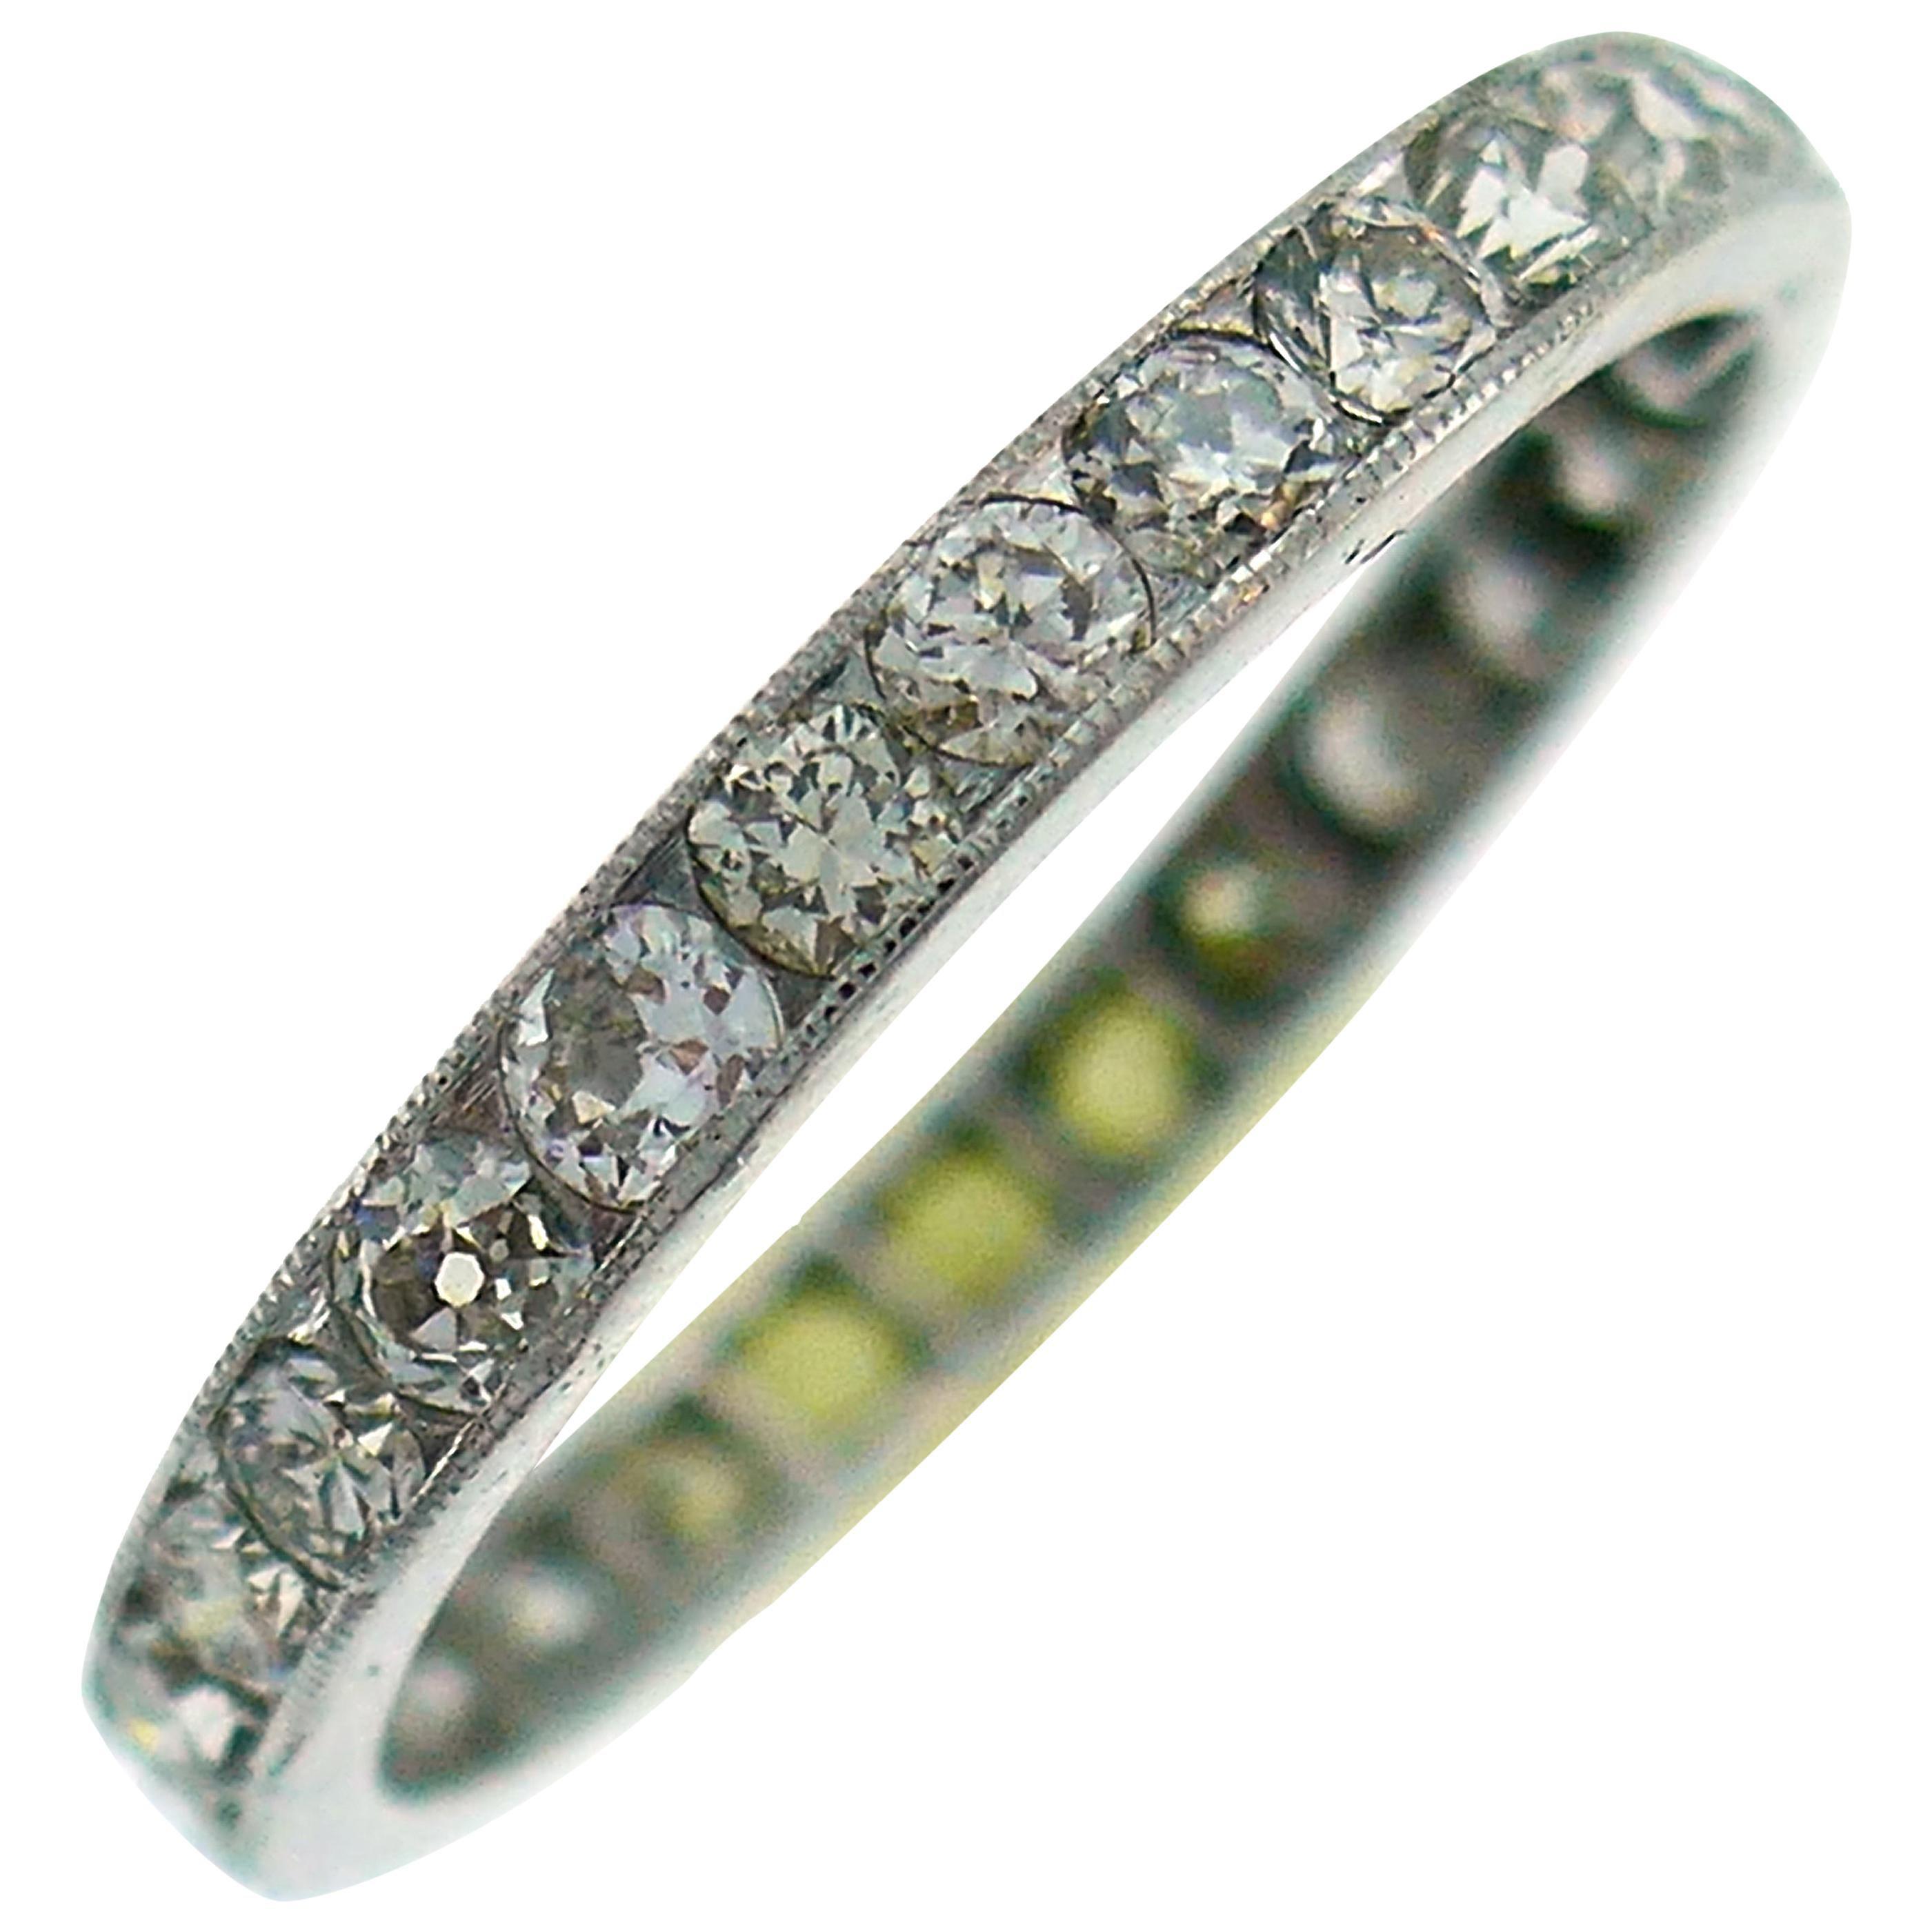 Art Deco Diamond Platinum Eternity Band Ring Old European Cut Wedding Size 7.5